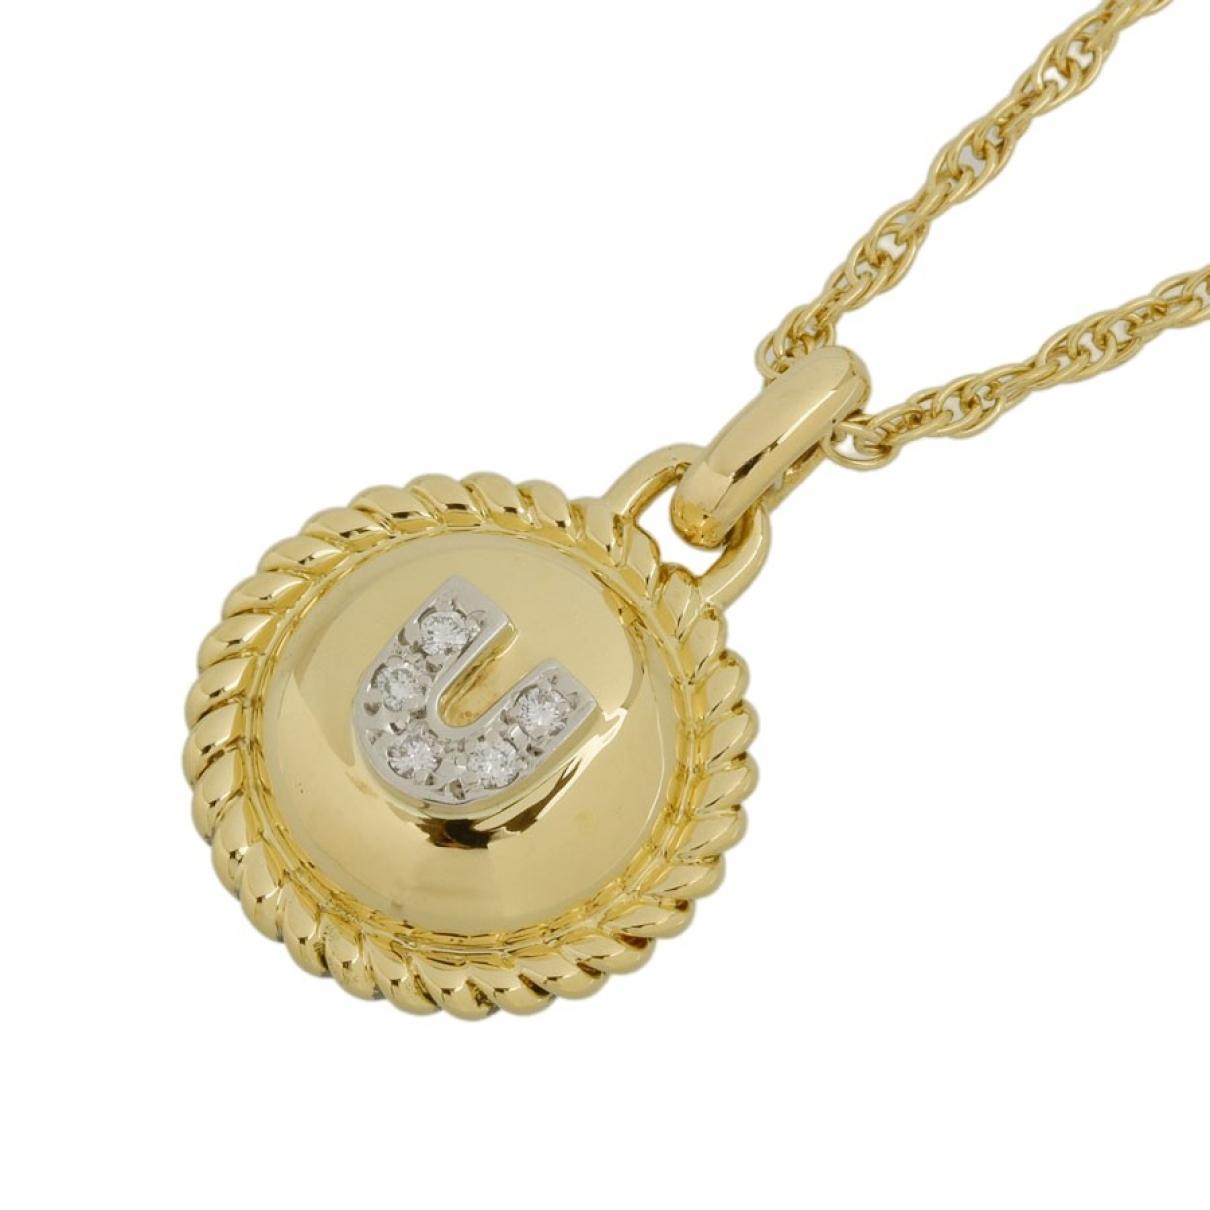 Emanuel Ungaro \N Kette in  Gold Vergoldet